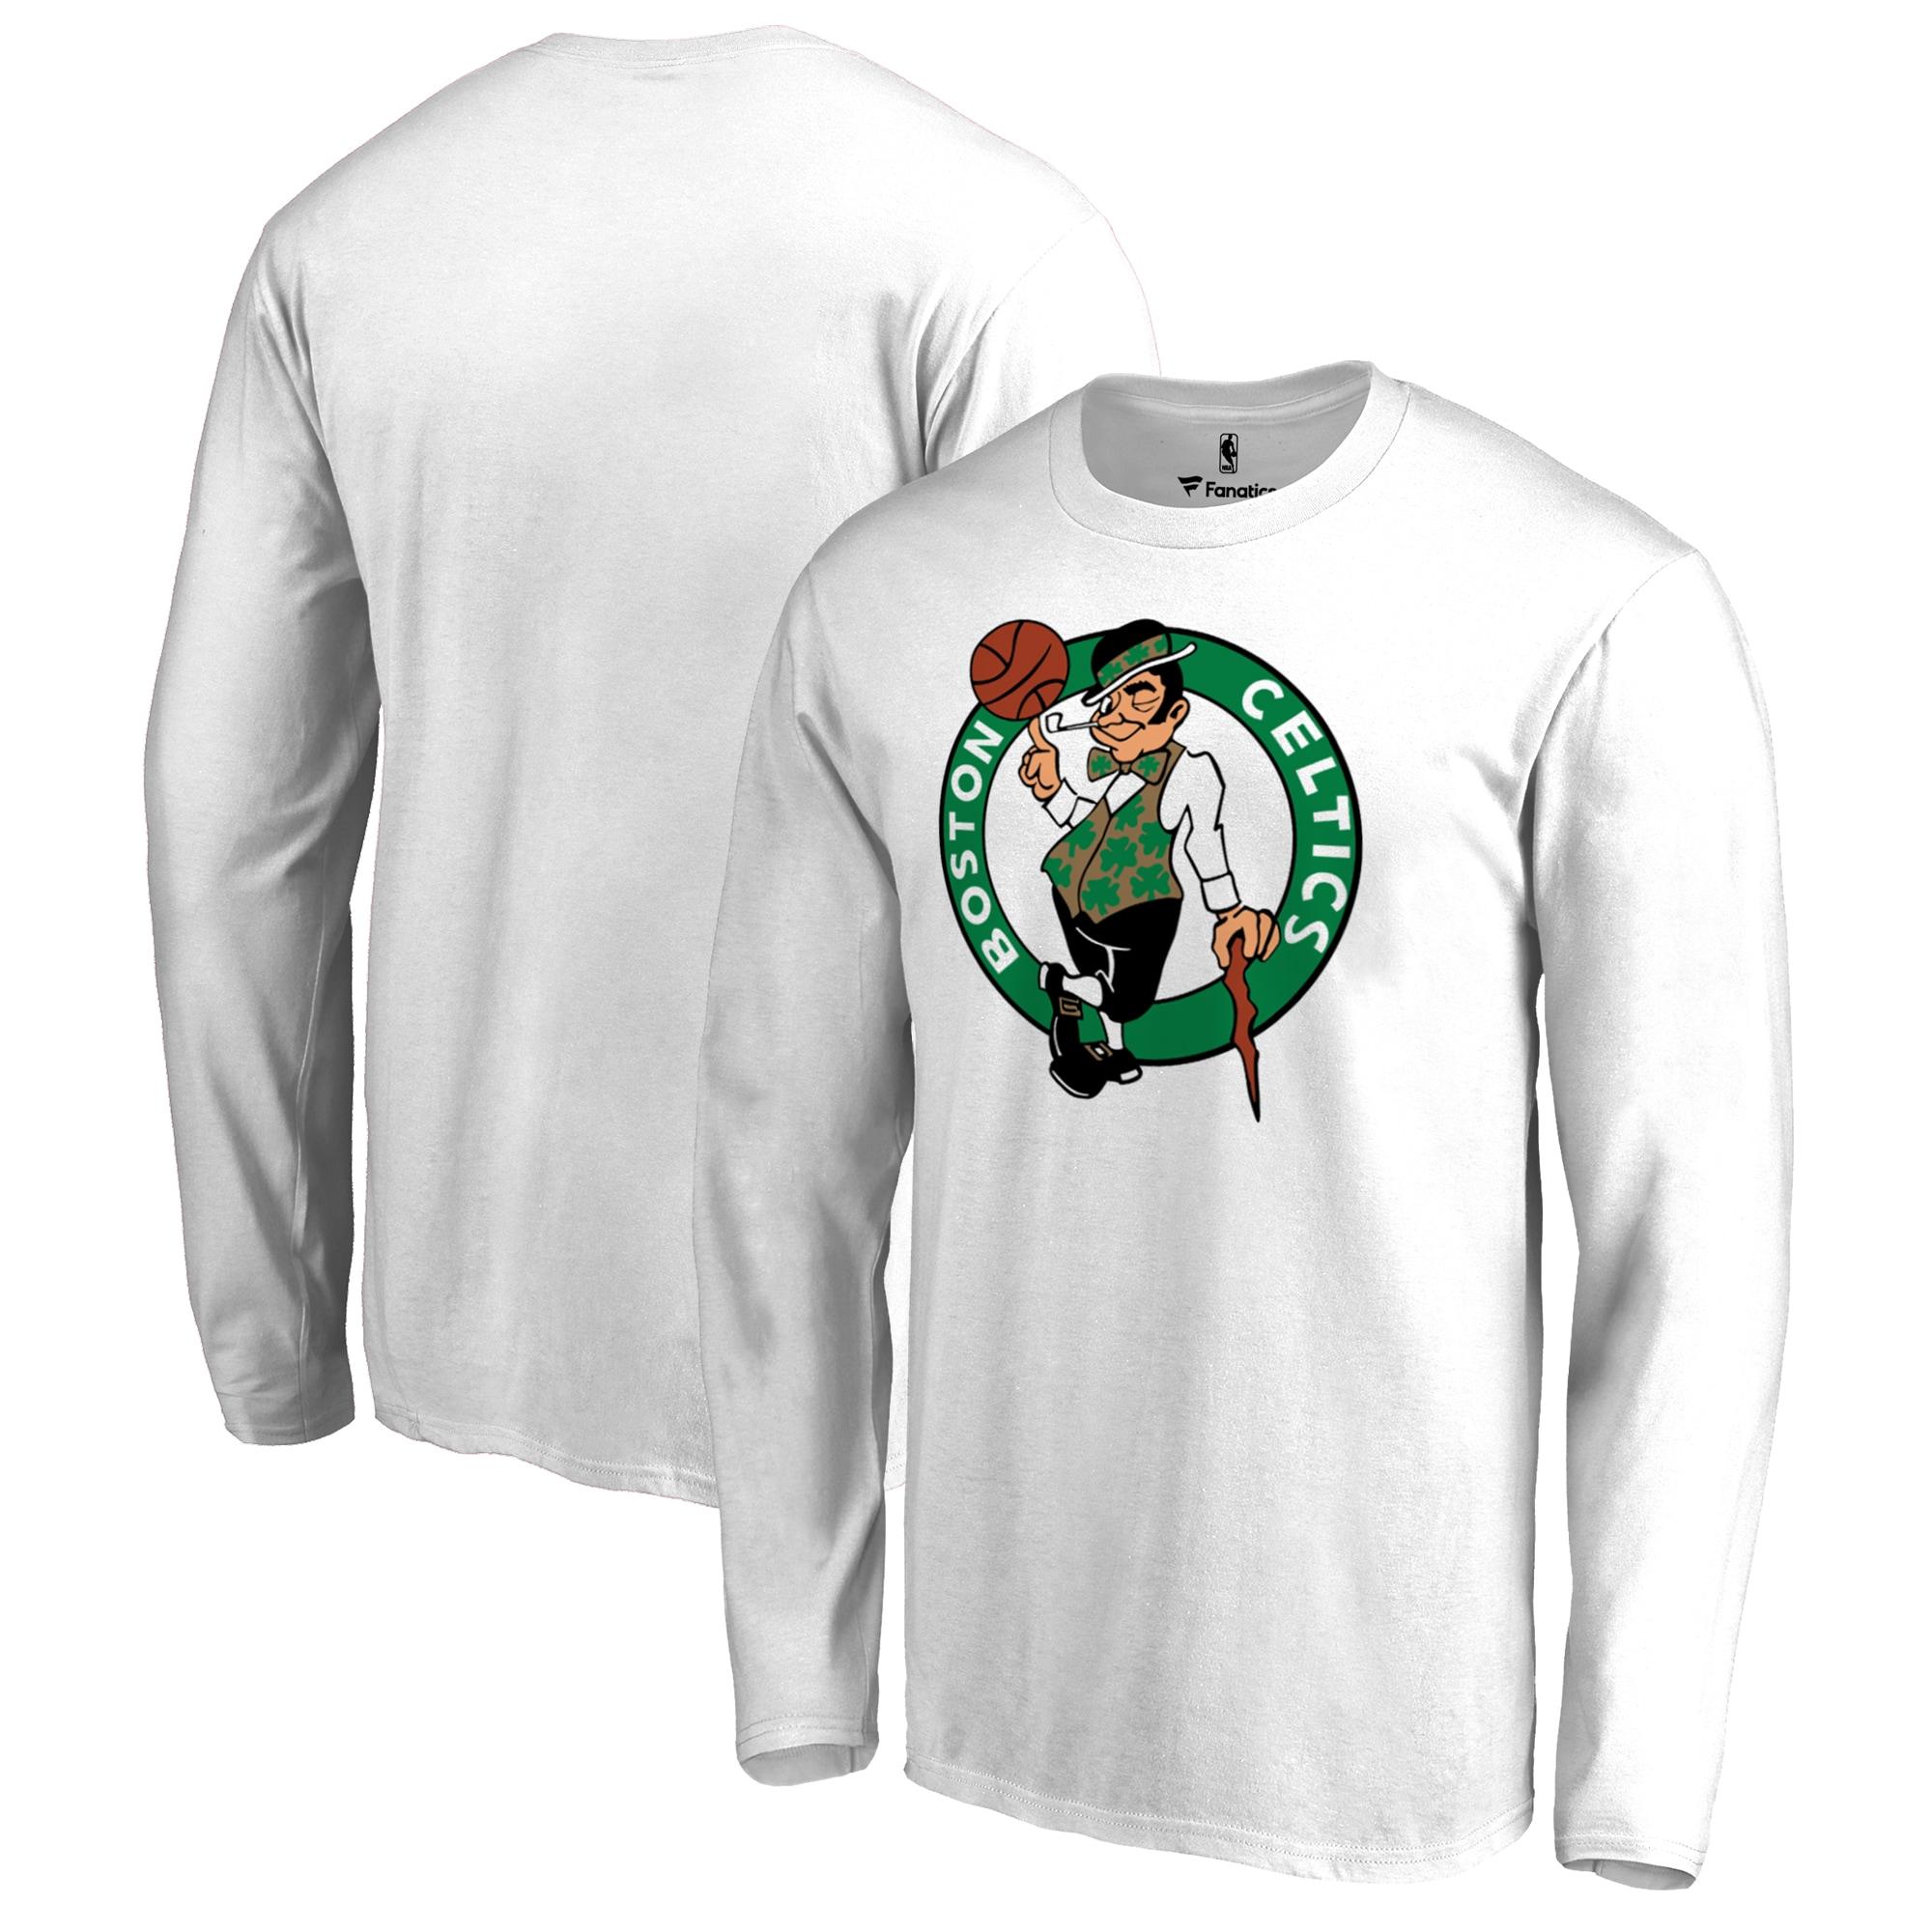 Boston Celtics Fanatics Branded Big & Tall Team Primary Logo Long Sleeve T-Shirt - White